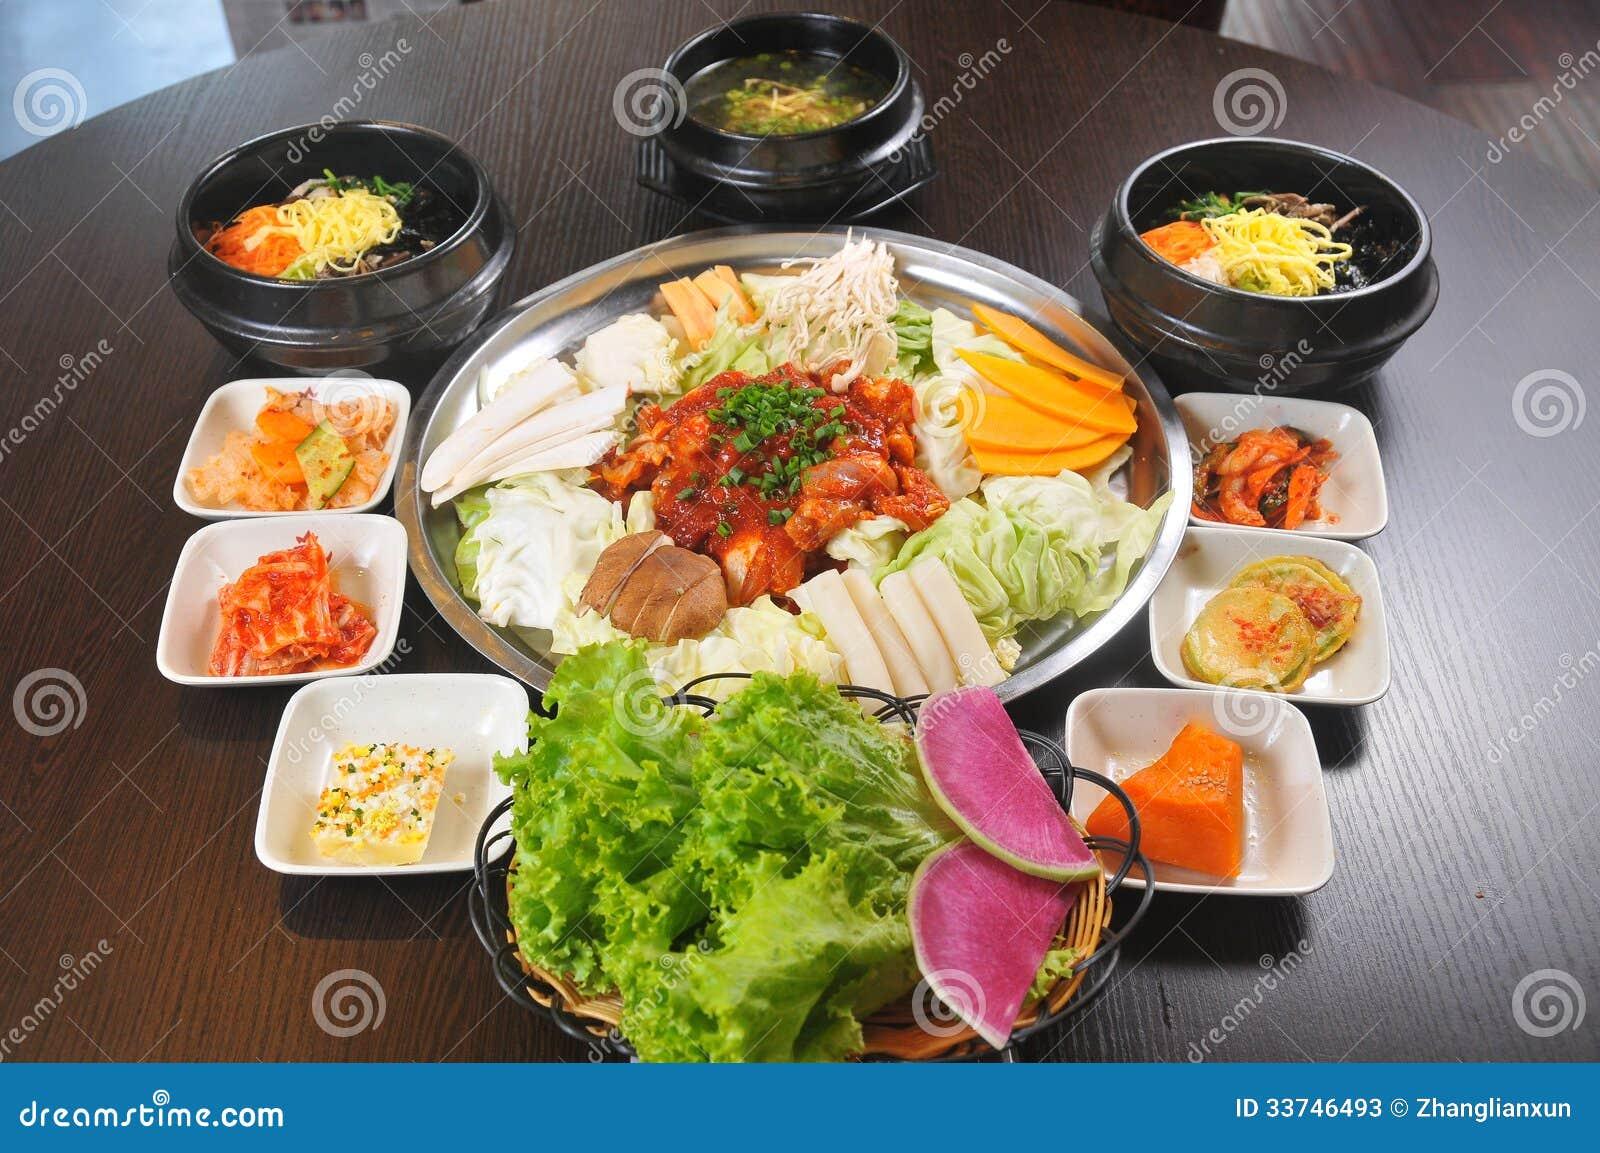 Korean cuisine stock photos image 33746493 for About korean cuisine